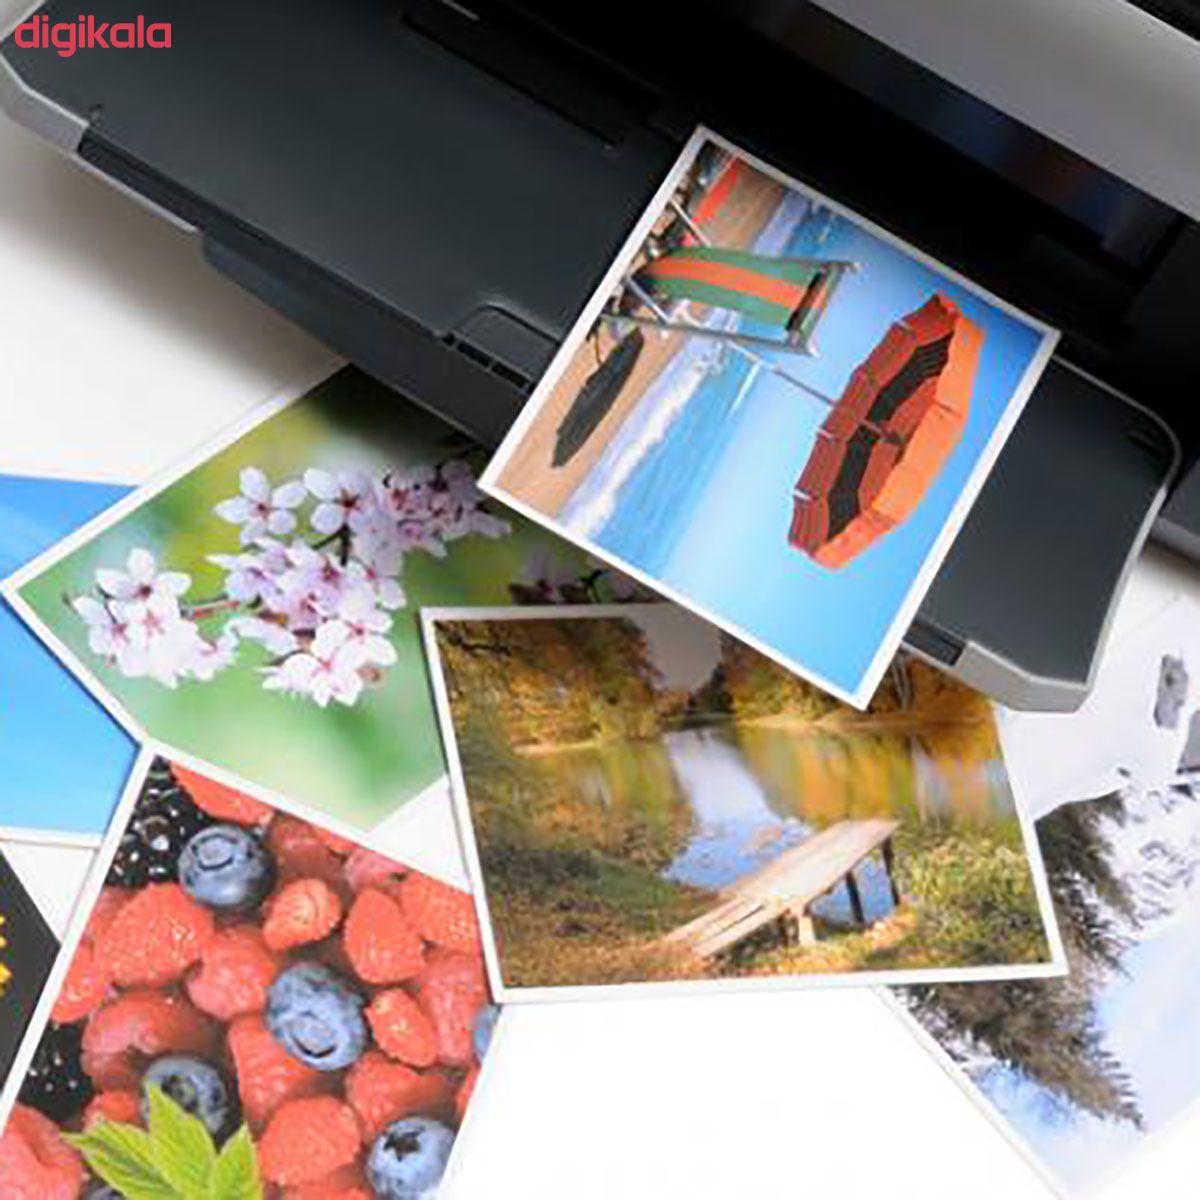 کاغذ چاپ رفیق مدل 102 سایز A4 بسته 20 عددی main 1 2